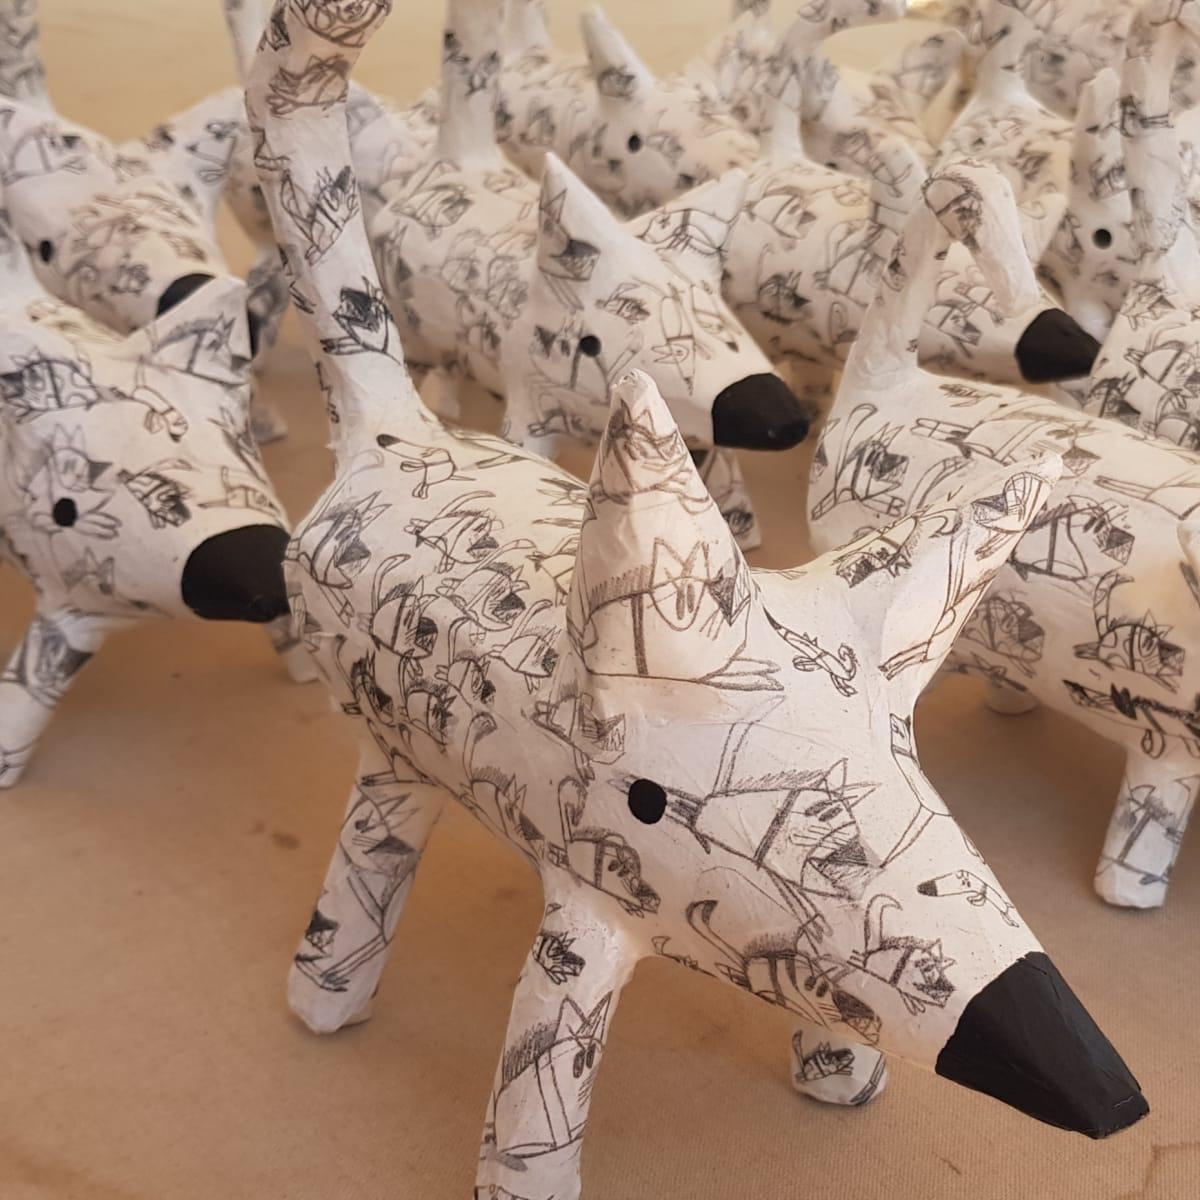 Dion Beasley Cheeky Dog, 2019 Paper-mache Various